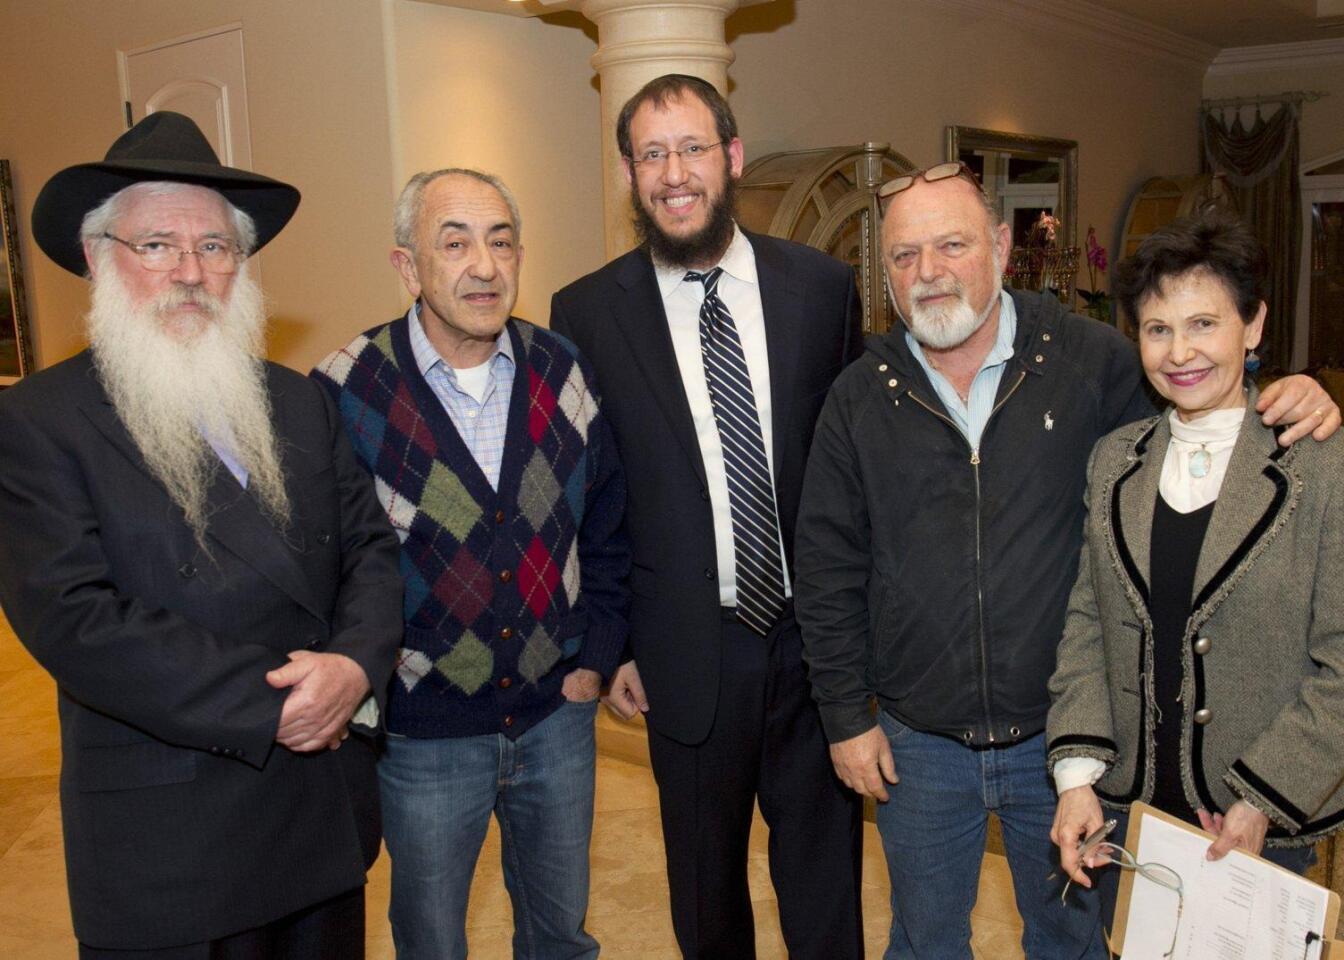 Guest speaker Rabbi Manis Friedman, Pinchas Fisher, Rabbi Levi Raskin, Shlomo and Pnina Gruer